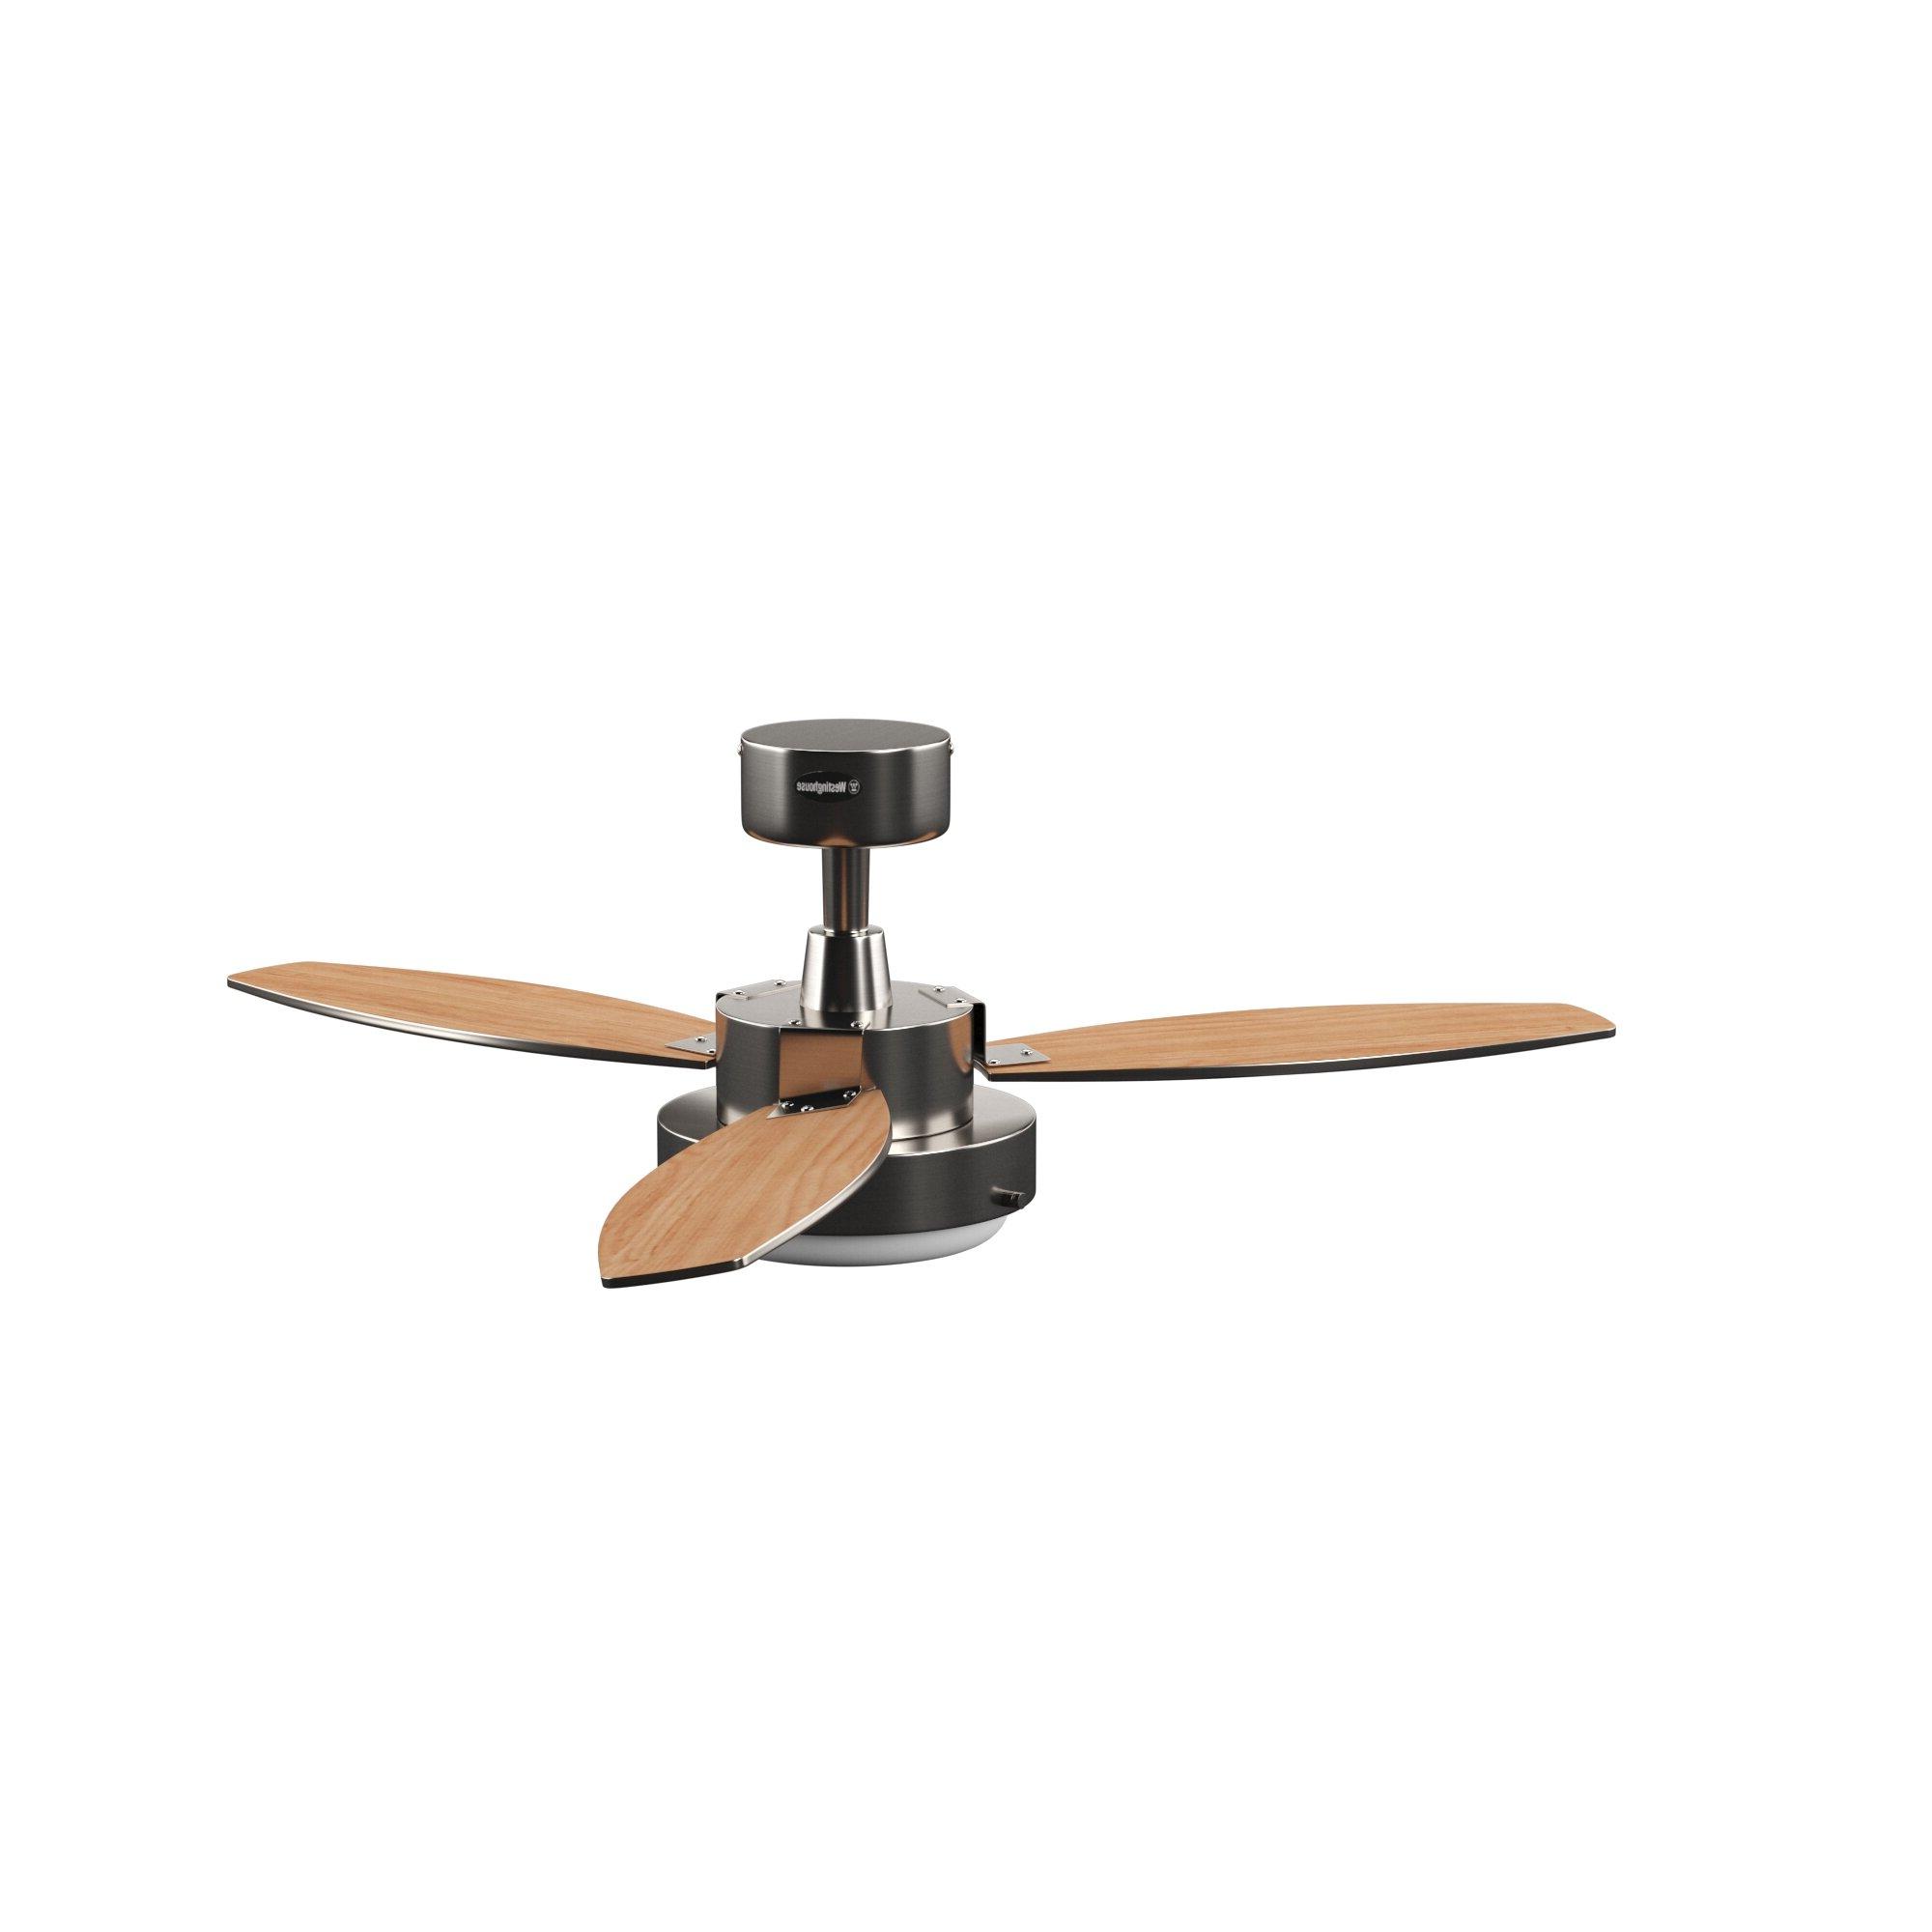 "Well Liked 42"" Corsa 3 Blade Ceiling Fan Light Kit Included Inside Corsa 3 Blade Ceiling Fans (View 20 of 20)"